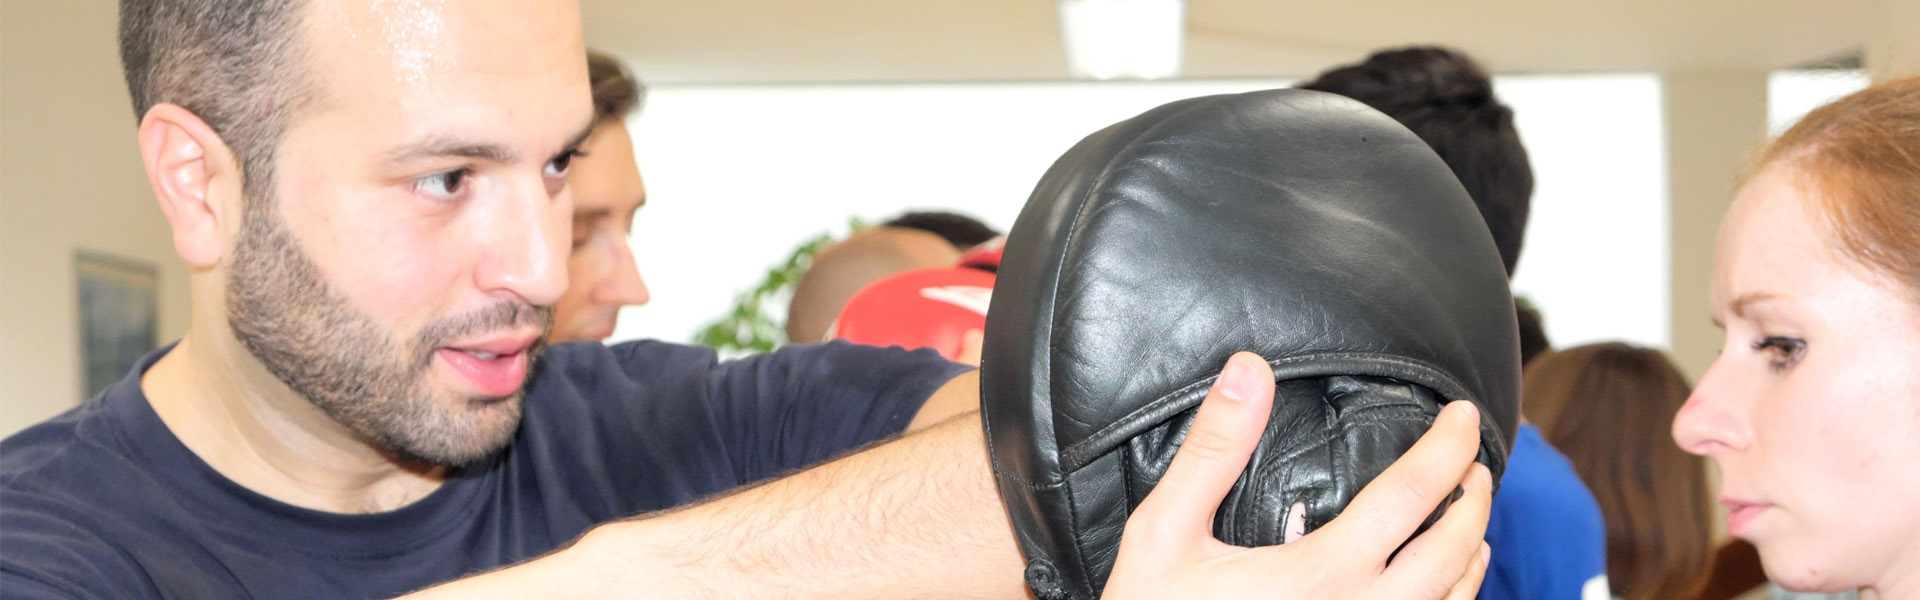 Kampsport, Kampfkunst, Selbstverteidigung, Wing Tzun, Wing Tsun, Wing Chun, Fachschule für Selbstverteidigung